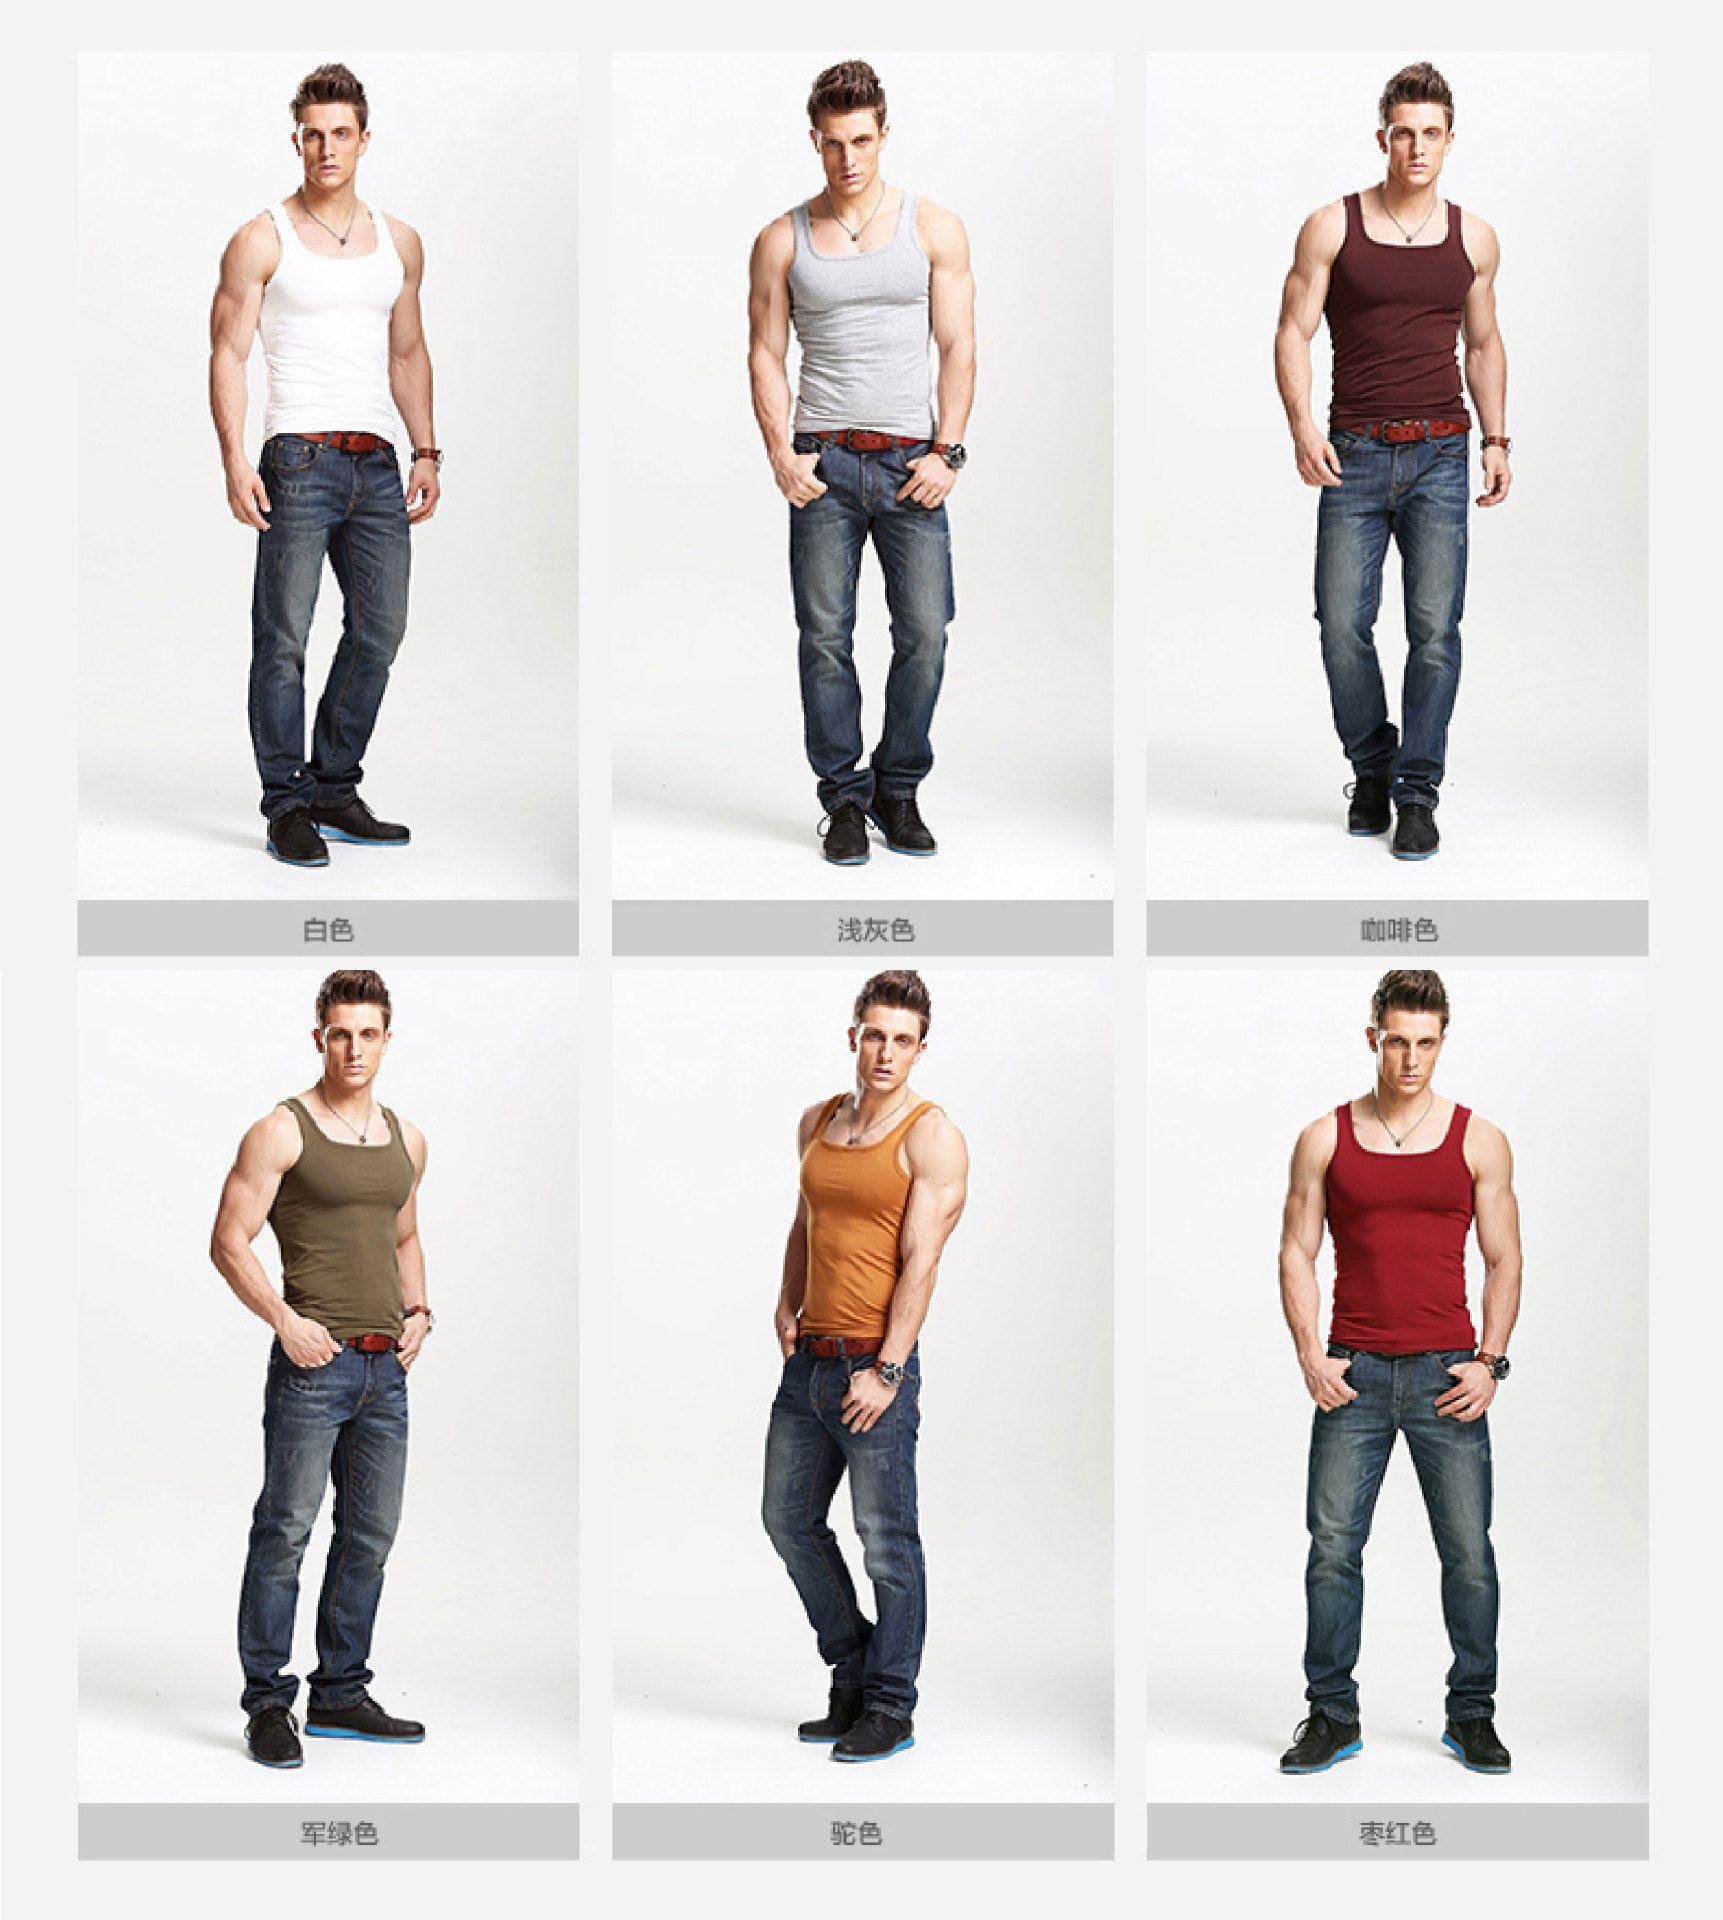 ad3cfeed18 2019 New Style Men s Clothing Fishnet Breathable Mens Vest Slim Fit T-shirt  Fashion Short Sleeve Tshirts Collar Designer T Shirts Underwear Men s  Underwear ...